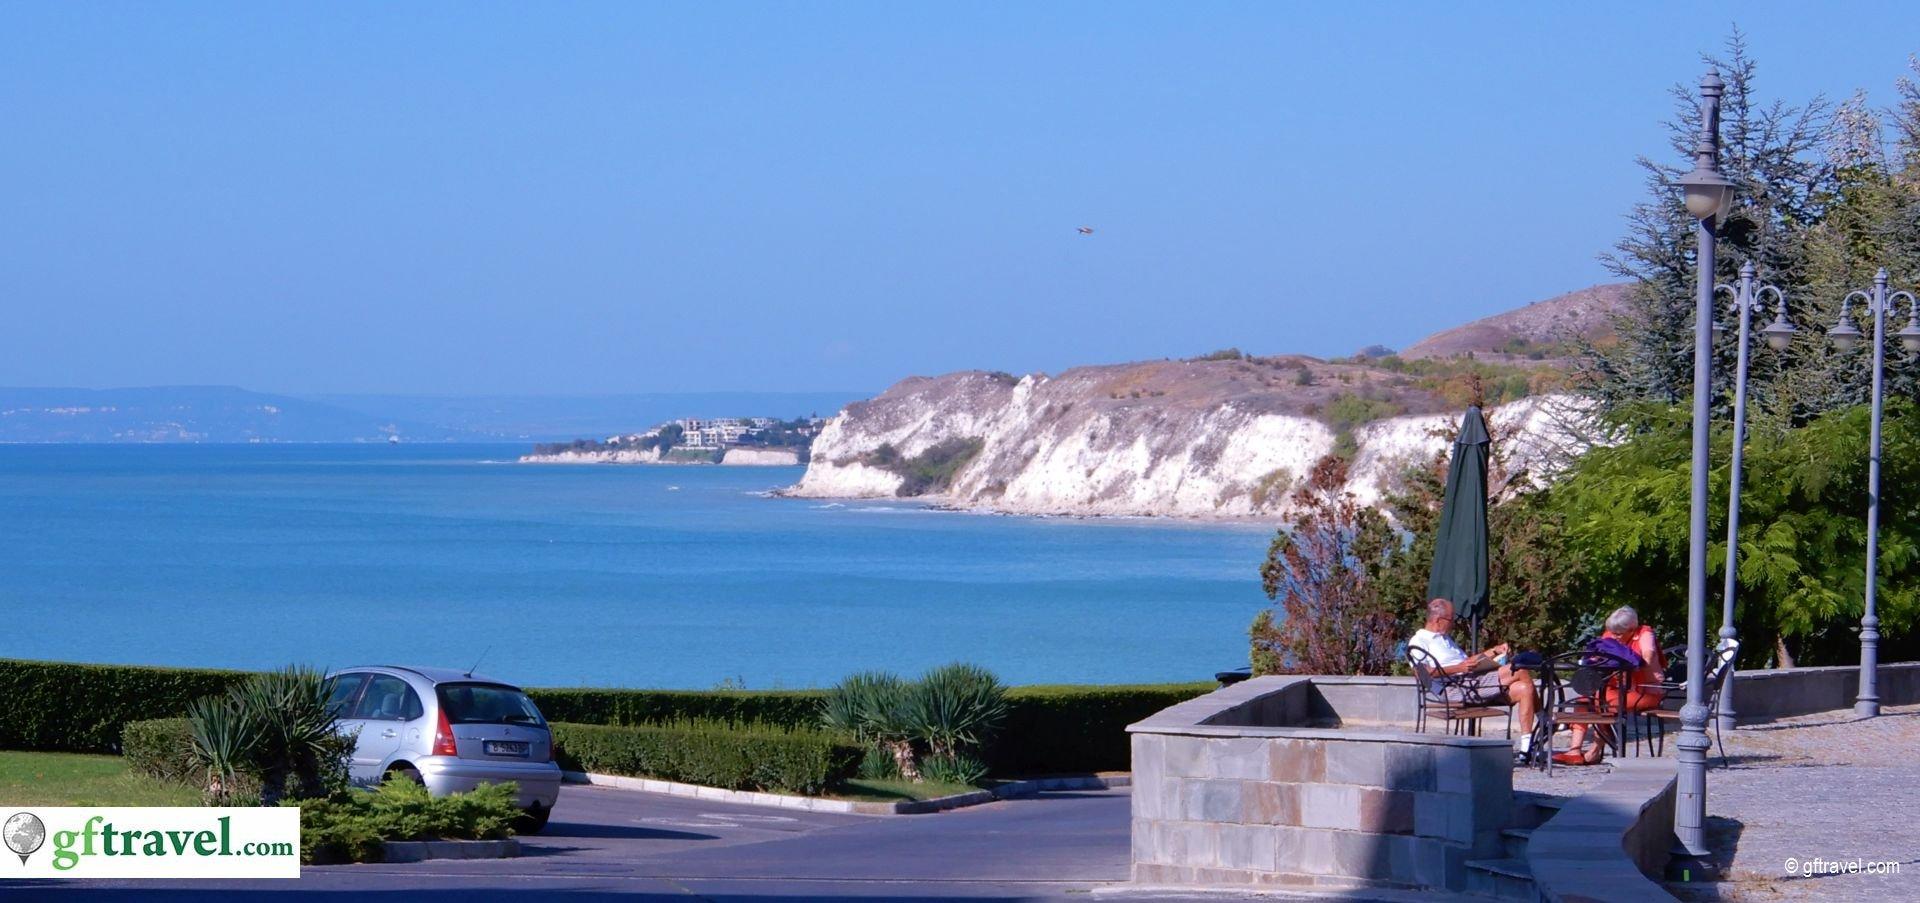 Golf-Gruppenreise-Thracian-Cliffs-Reisebericht-Ausblick-von-Rezeption